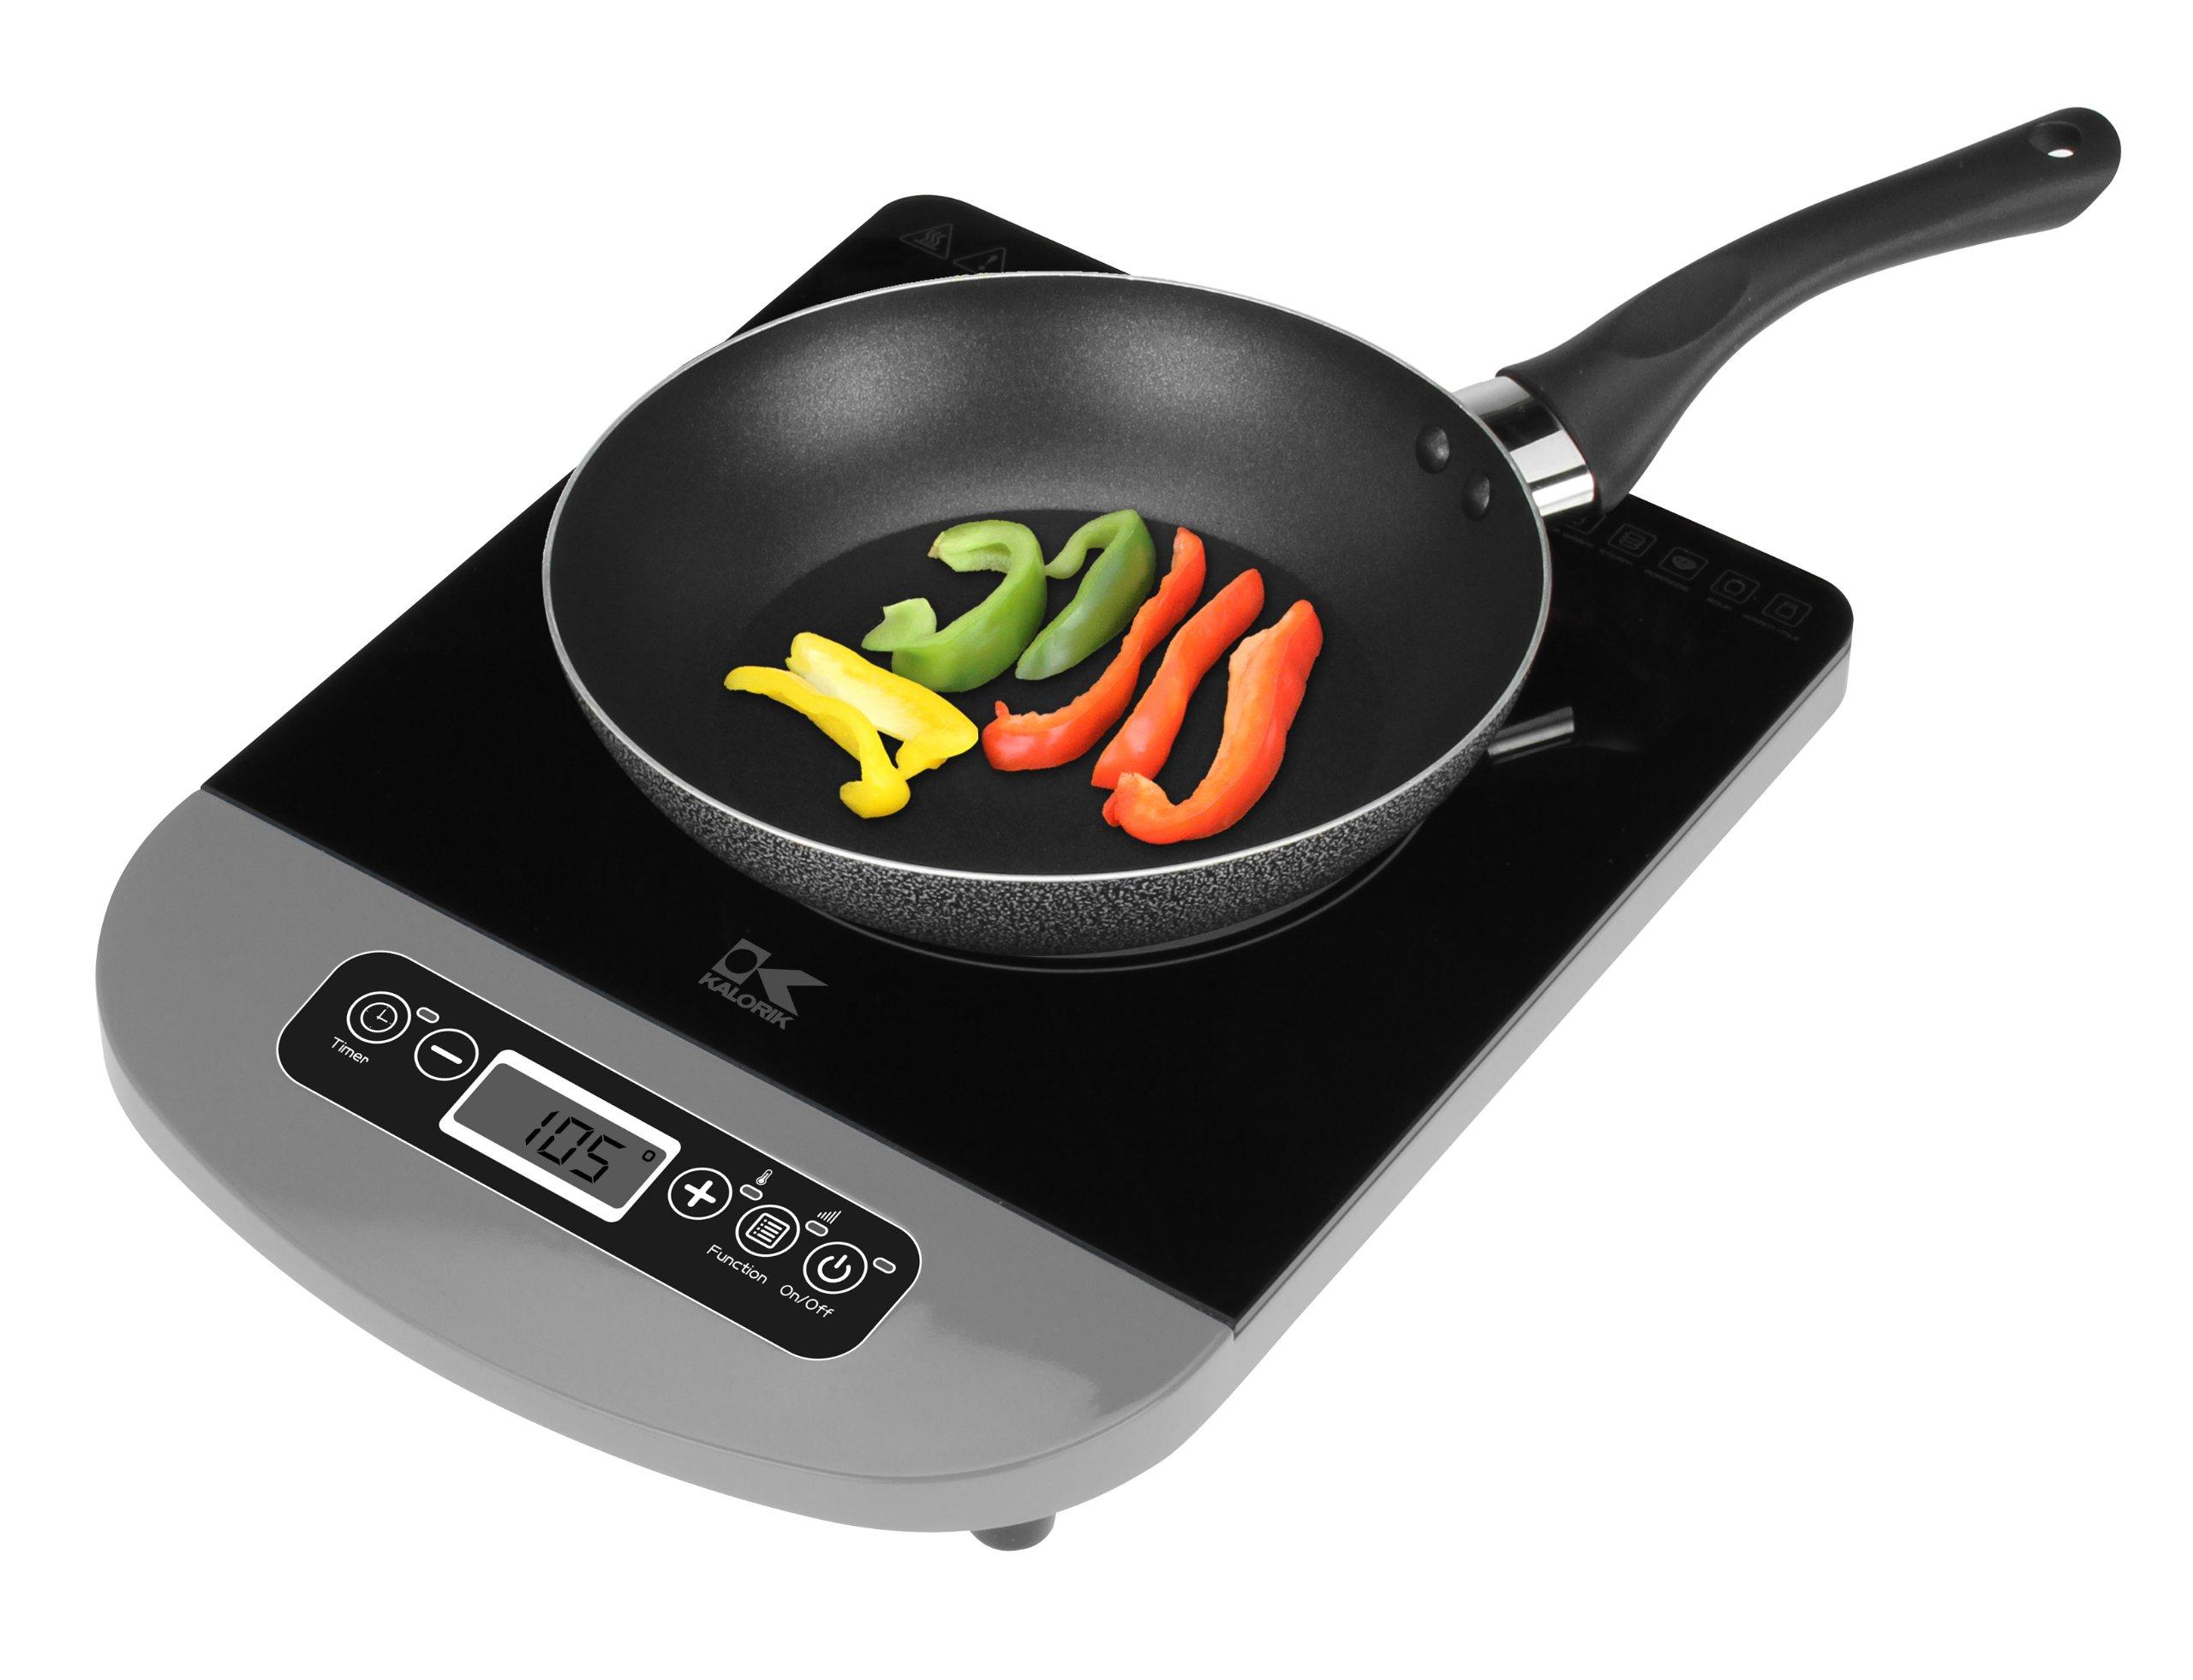 Kalorik IKP 40625 S Induction Cooking Plate, Silver